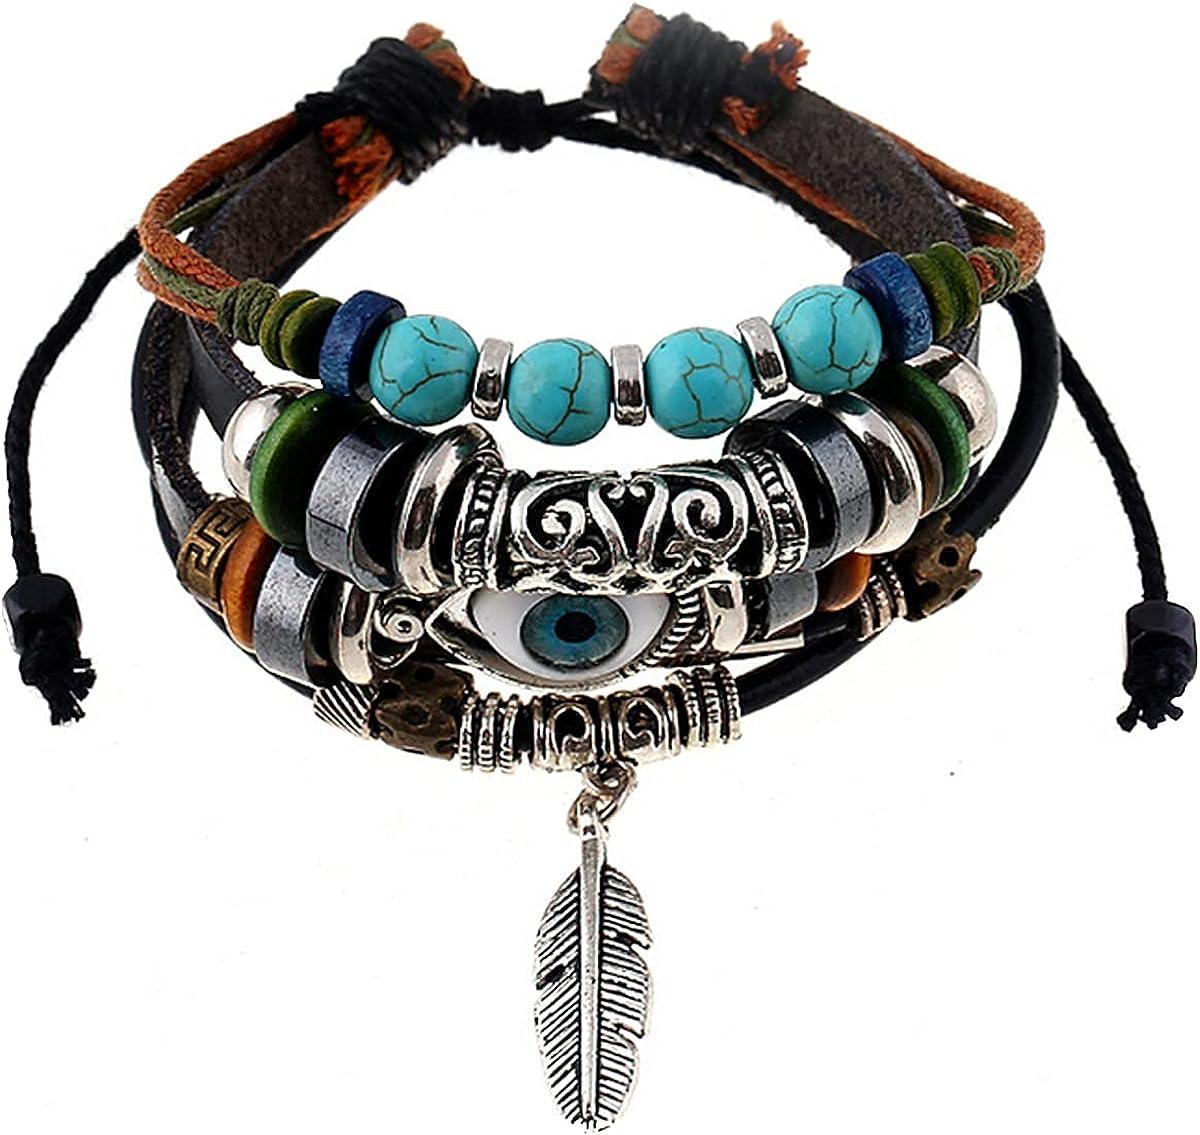 NIDEZHI Vintage Leaf Charm Braided Leather Bracelet Cuff Pulling Adjustable Size Rope Bracelet Jewelry